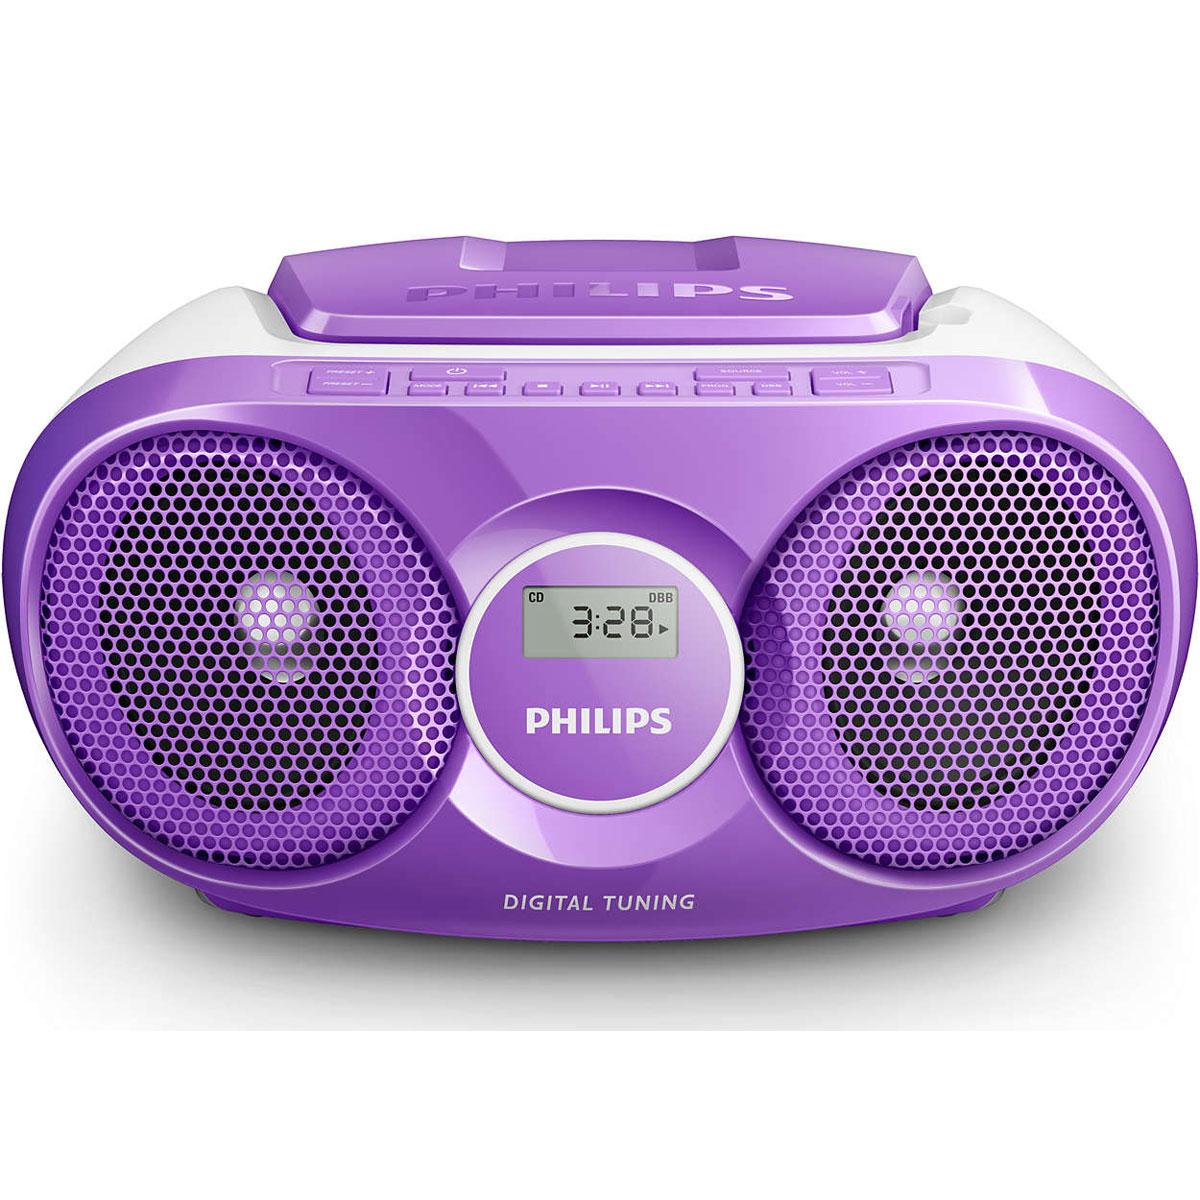 philips az215 violet radio radio r veil philips sur. Black Bedroom Furniture Sets. Home Design Ideas